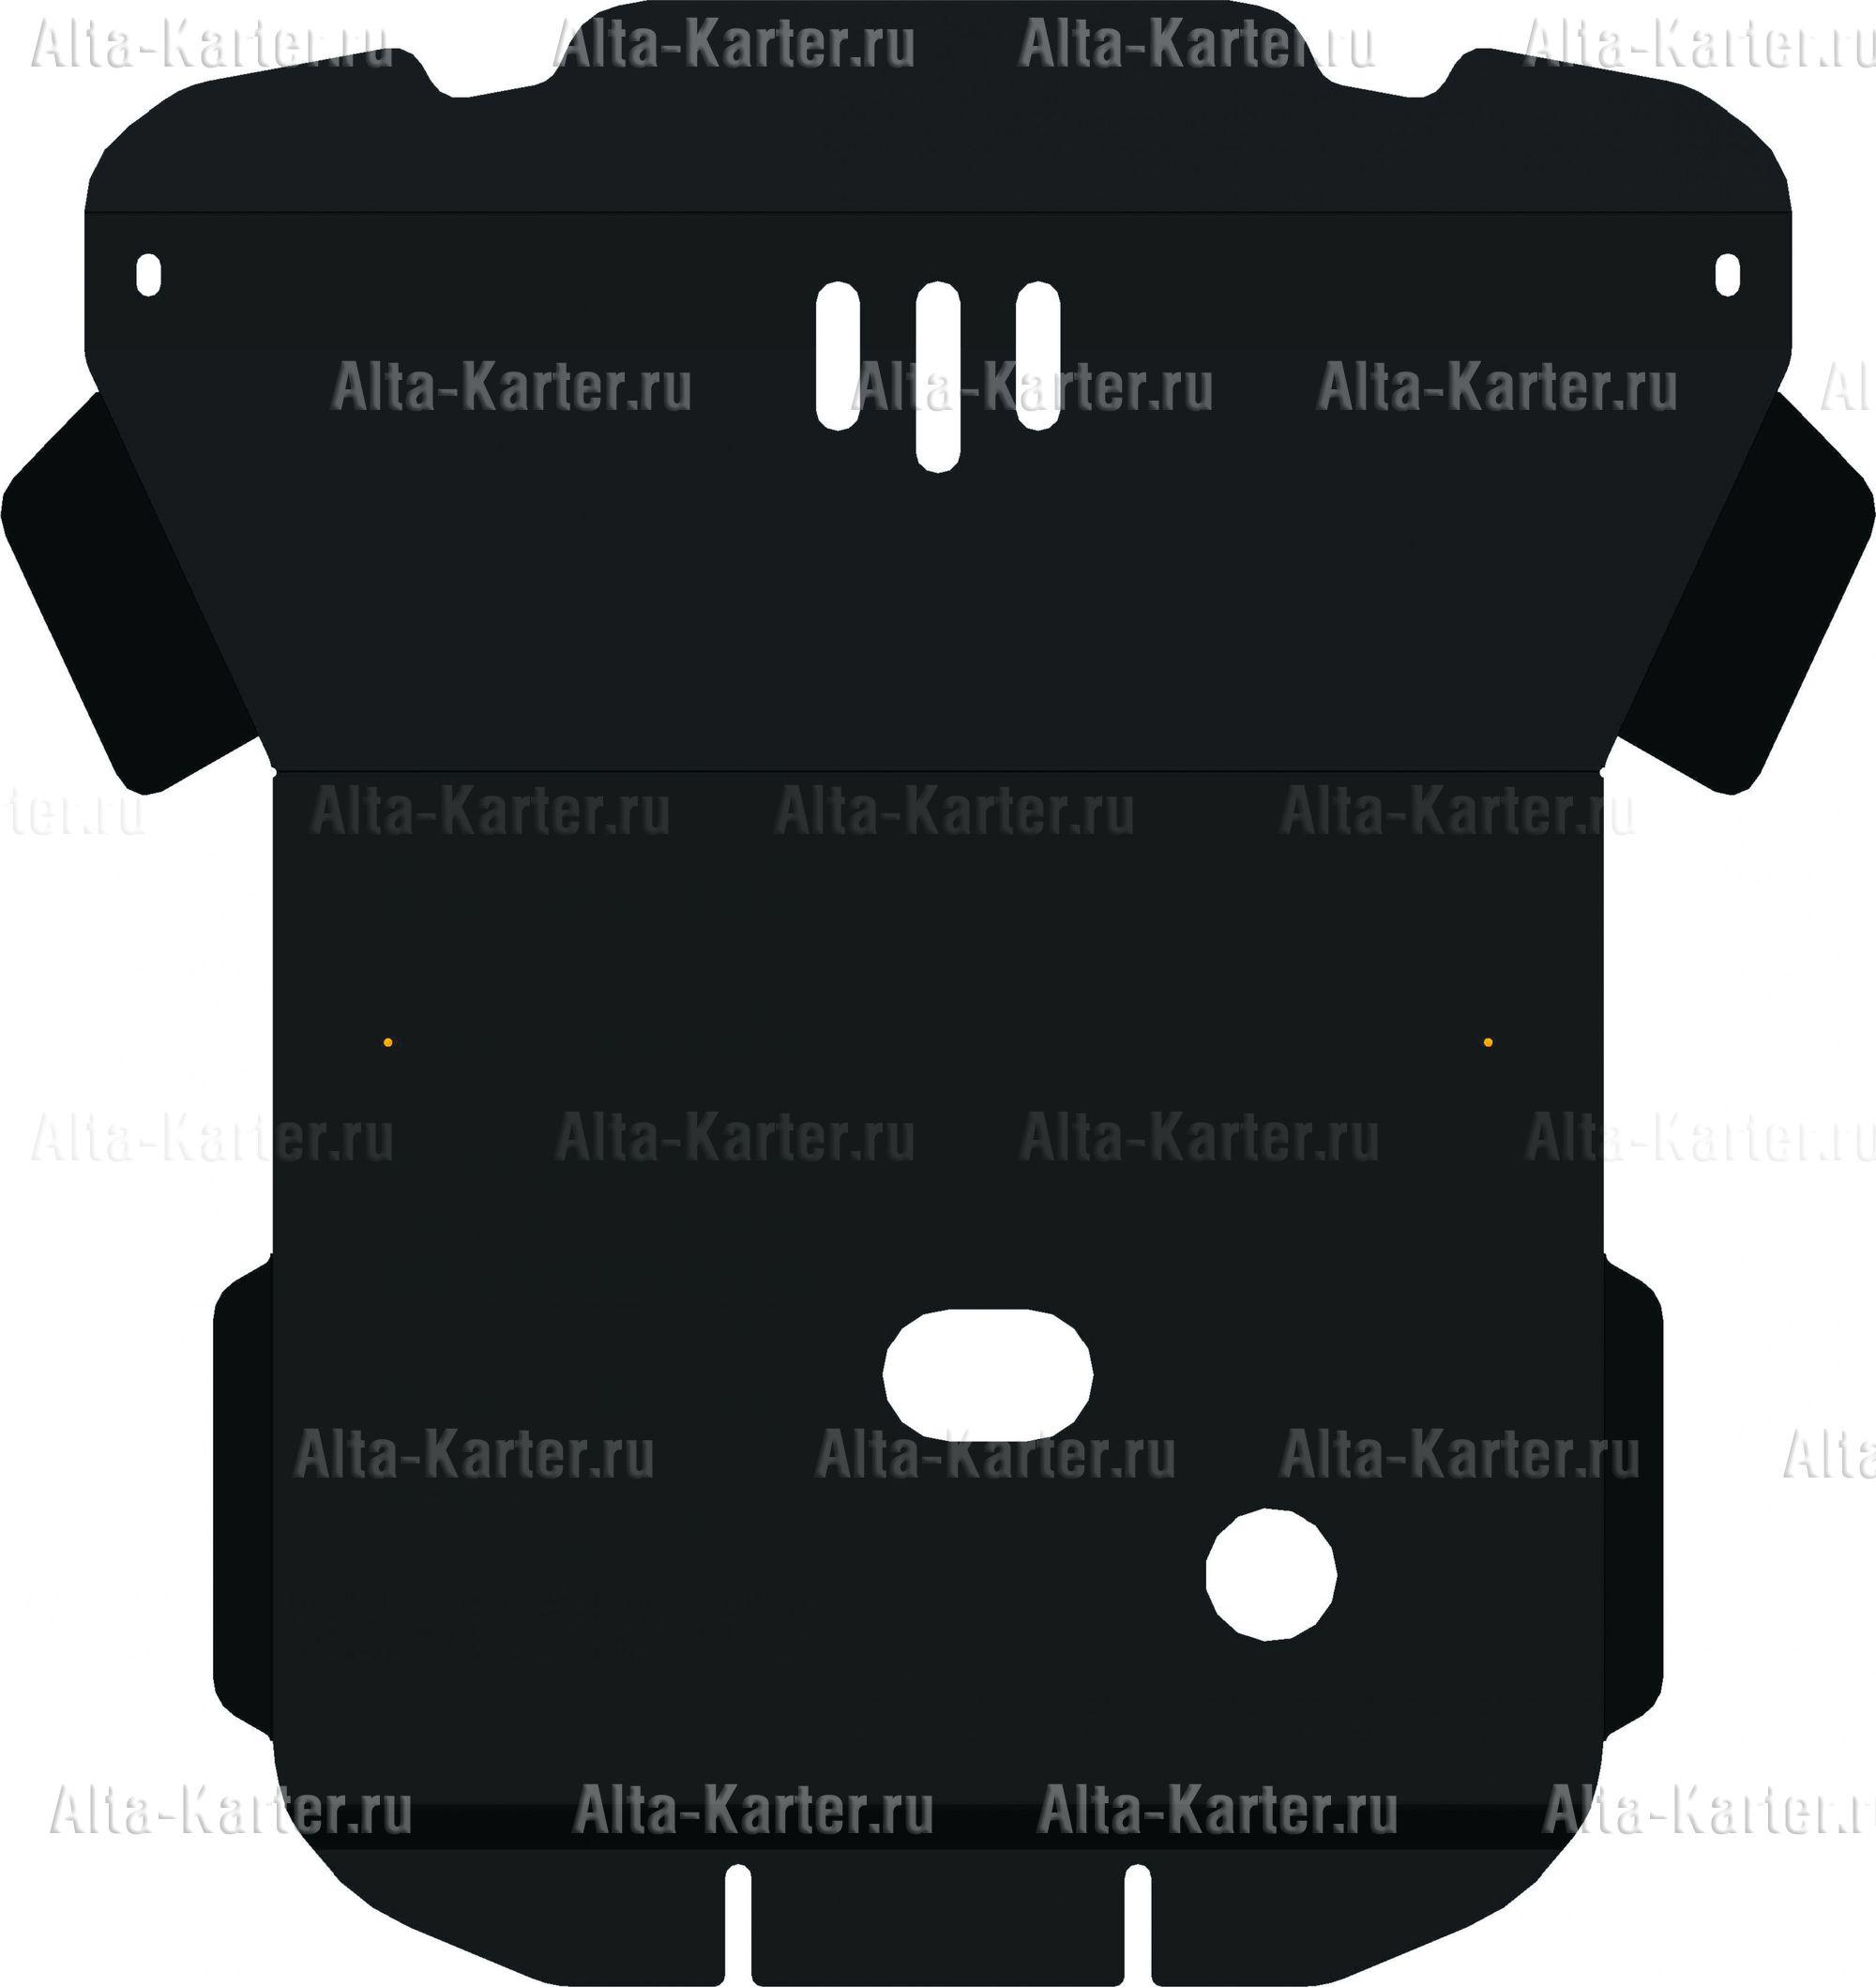 Защита Alfeco для картера SsangYong Rexton II Y250 2006-2012. Артикул ALF.21.05